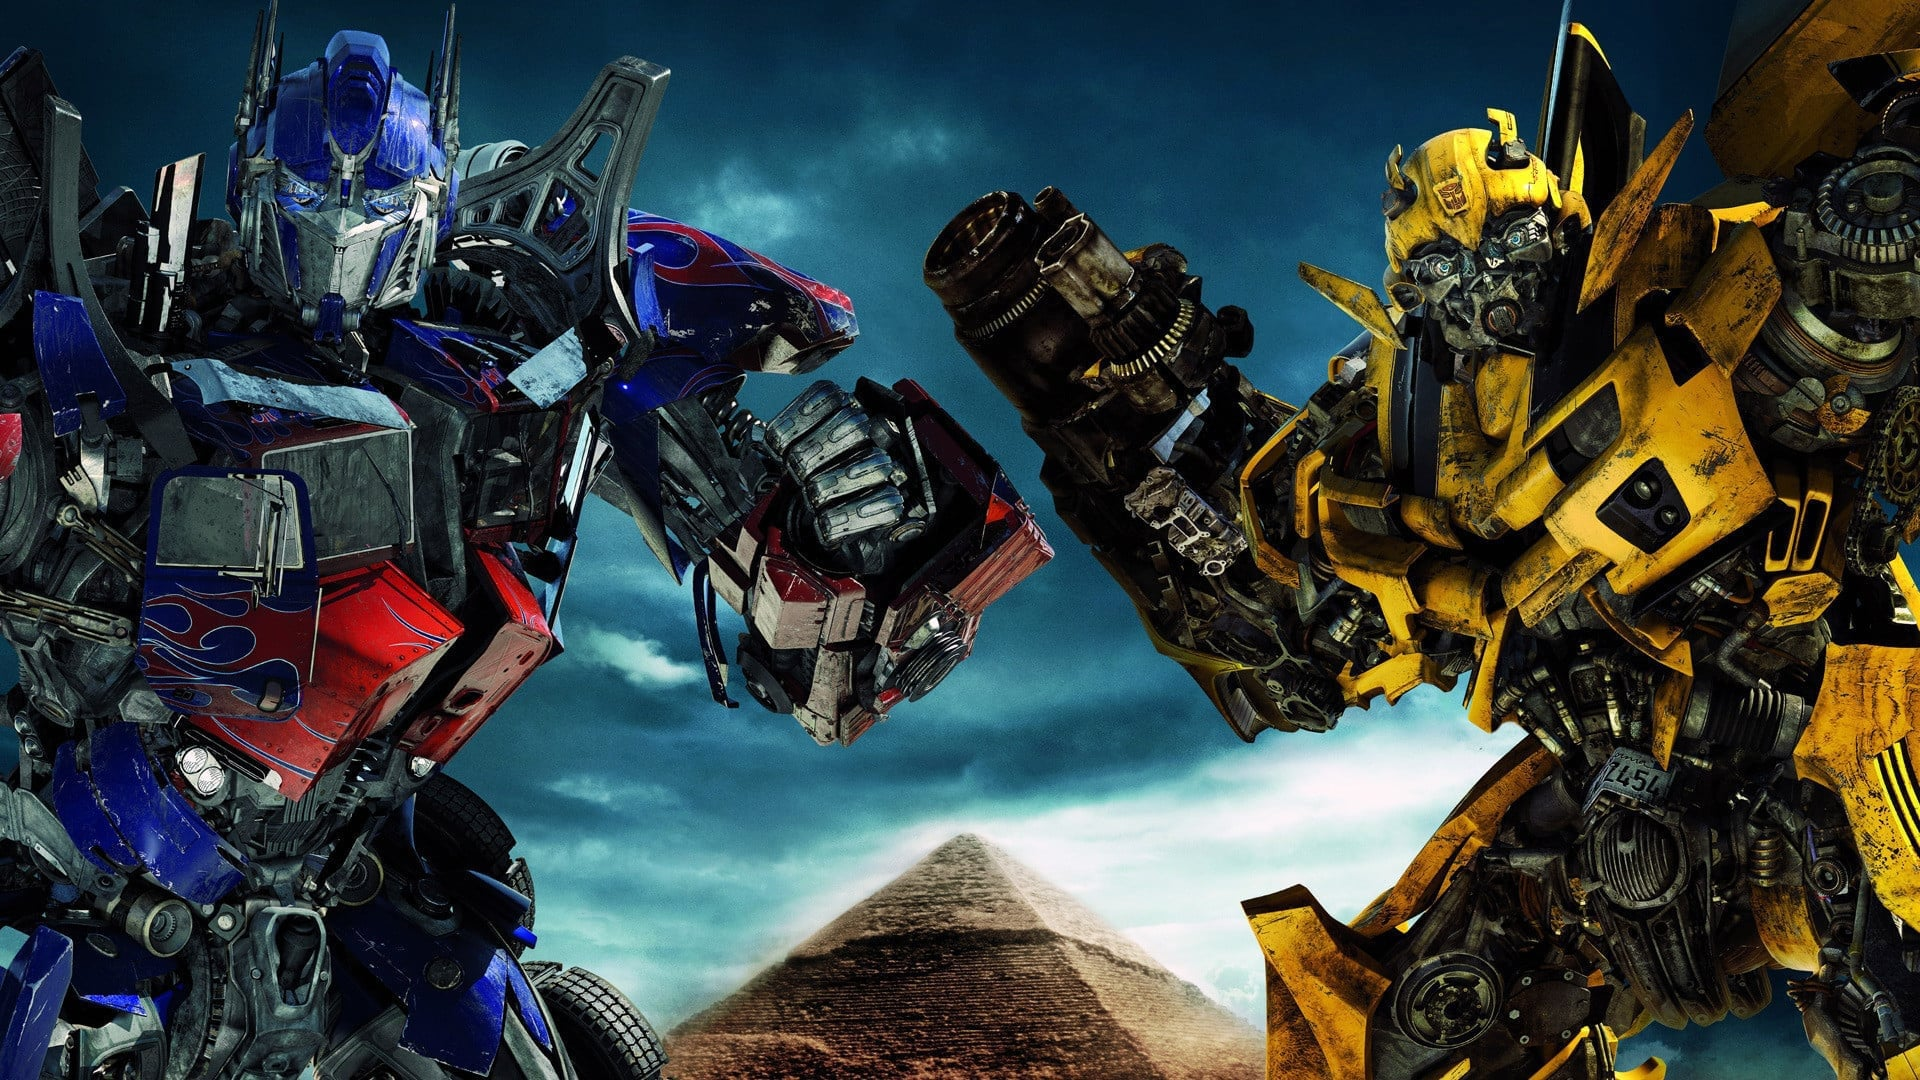 Filmszene aus Transformers - Die Rache